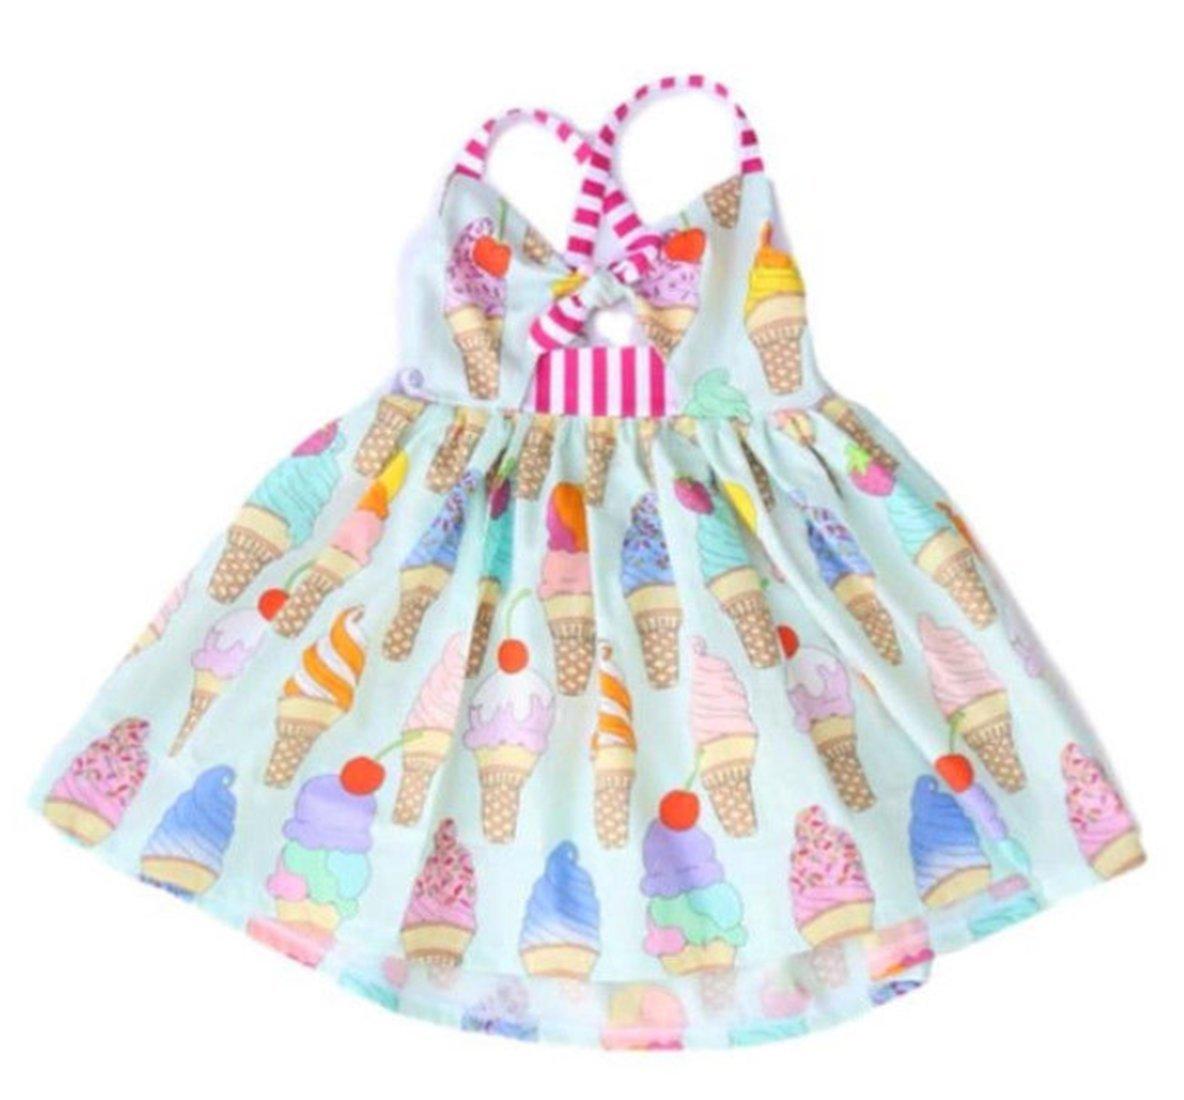 Toddler Girls Summer Ice Cream Print Strap Backless Beach Sundress Dress Size 12-18 Months/Tag90 (Colour)